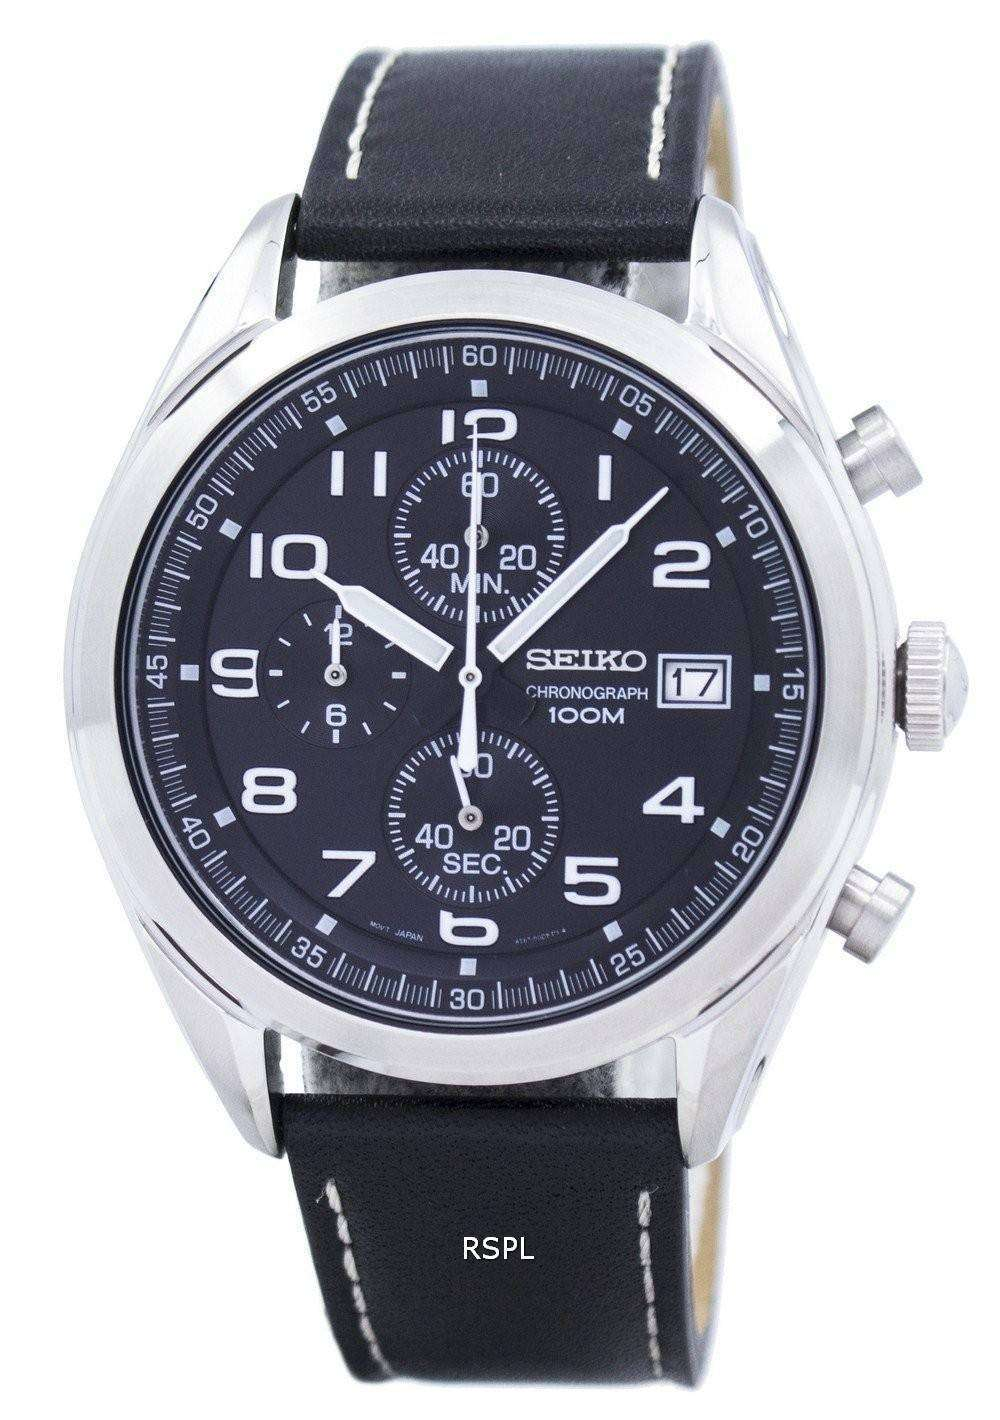 best website 5d37f a57c6 セイコー クロノグラフ クォーツ SSB271 SSB271P1 SSB271P メンズ腕時計